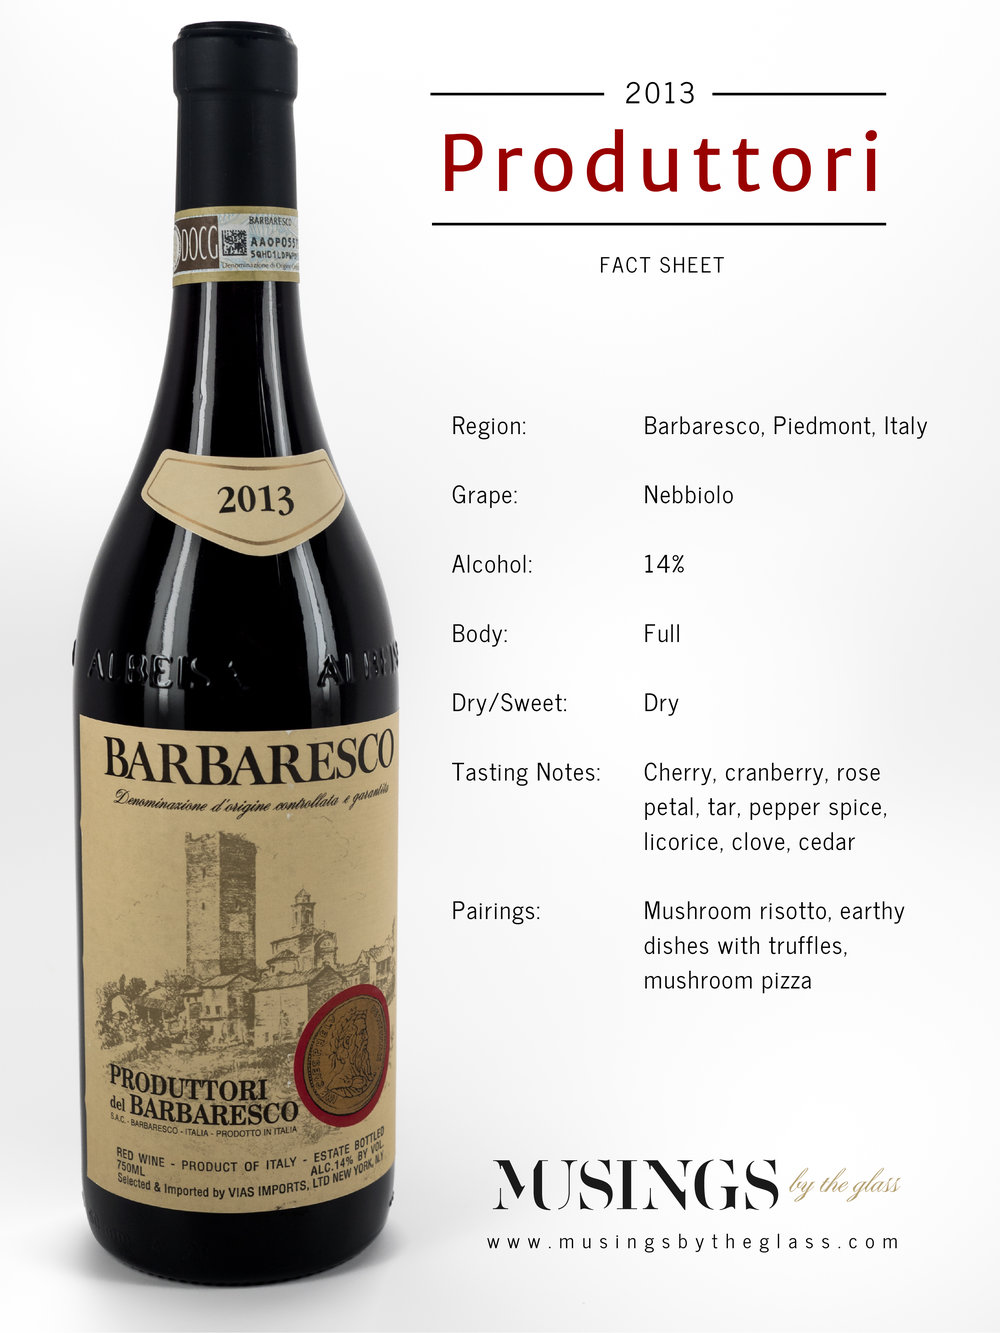 Musings by the Glass - Vino Pairing Optimization - 2013 Barbaresco Fact Sheet